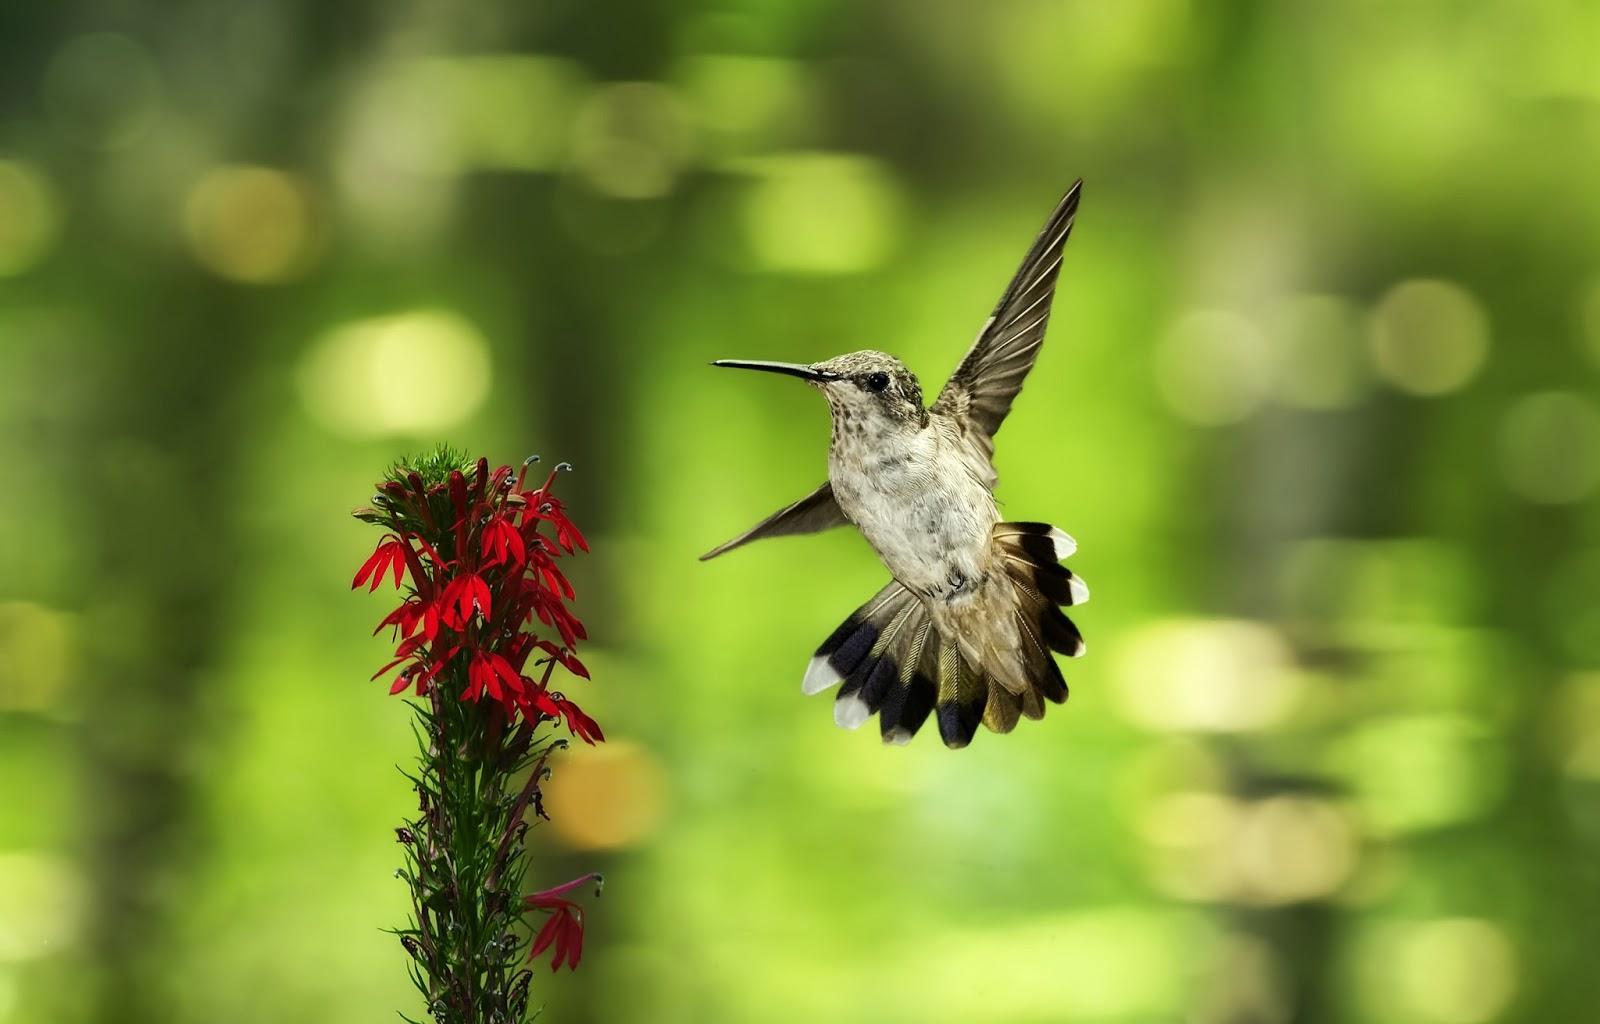 Hd Wallpapers: Hummingbird HD Wallpapers